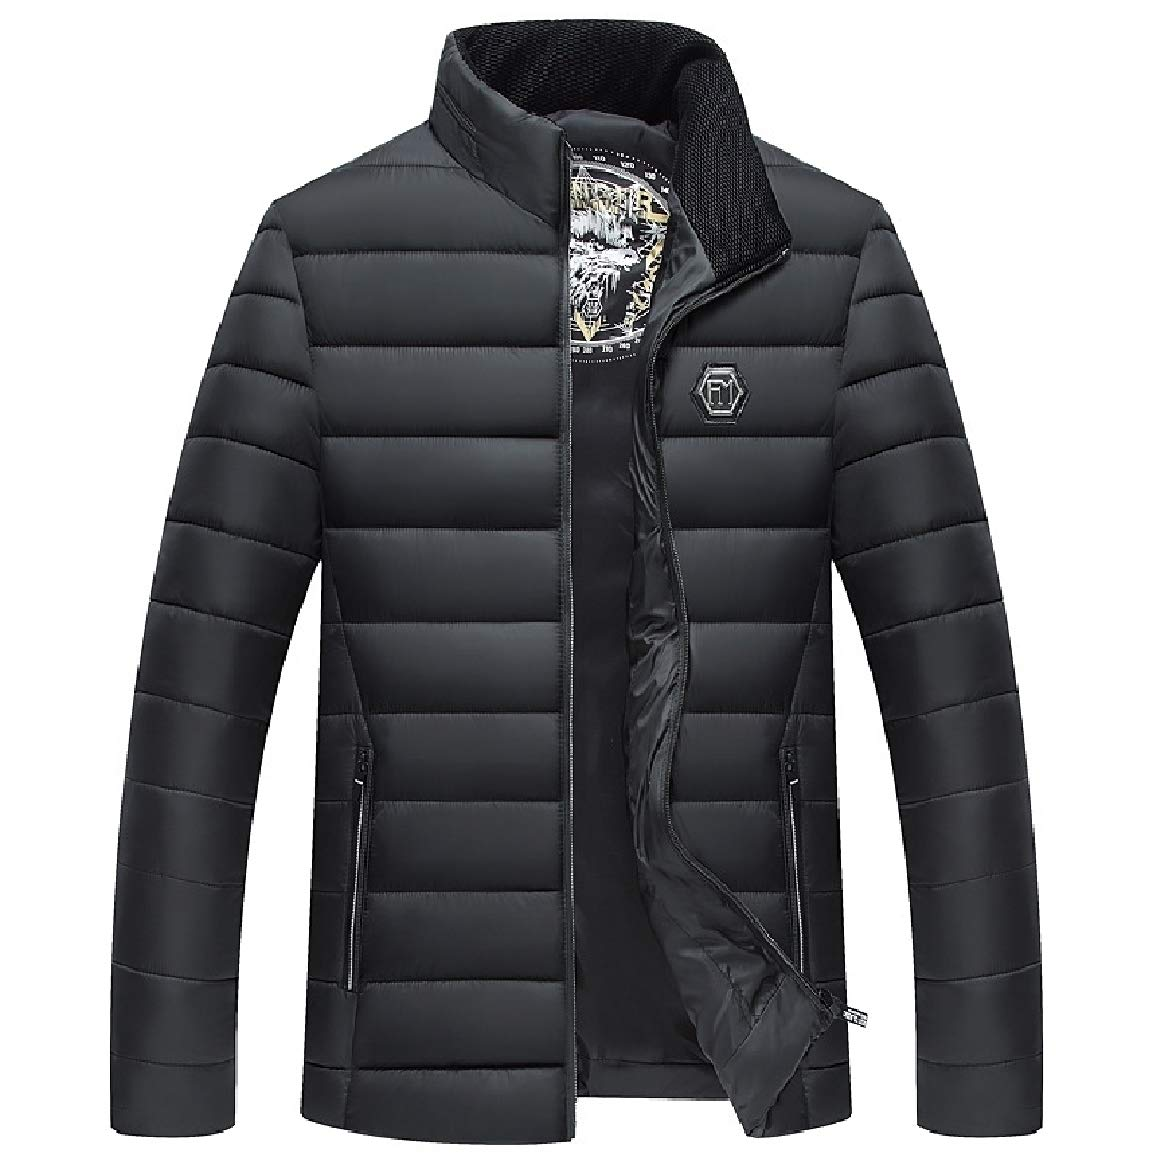 Abetteric Men Stand Collar Oversized Pockets Zip Plus-Size Puffer Jacket